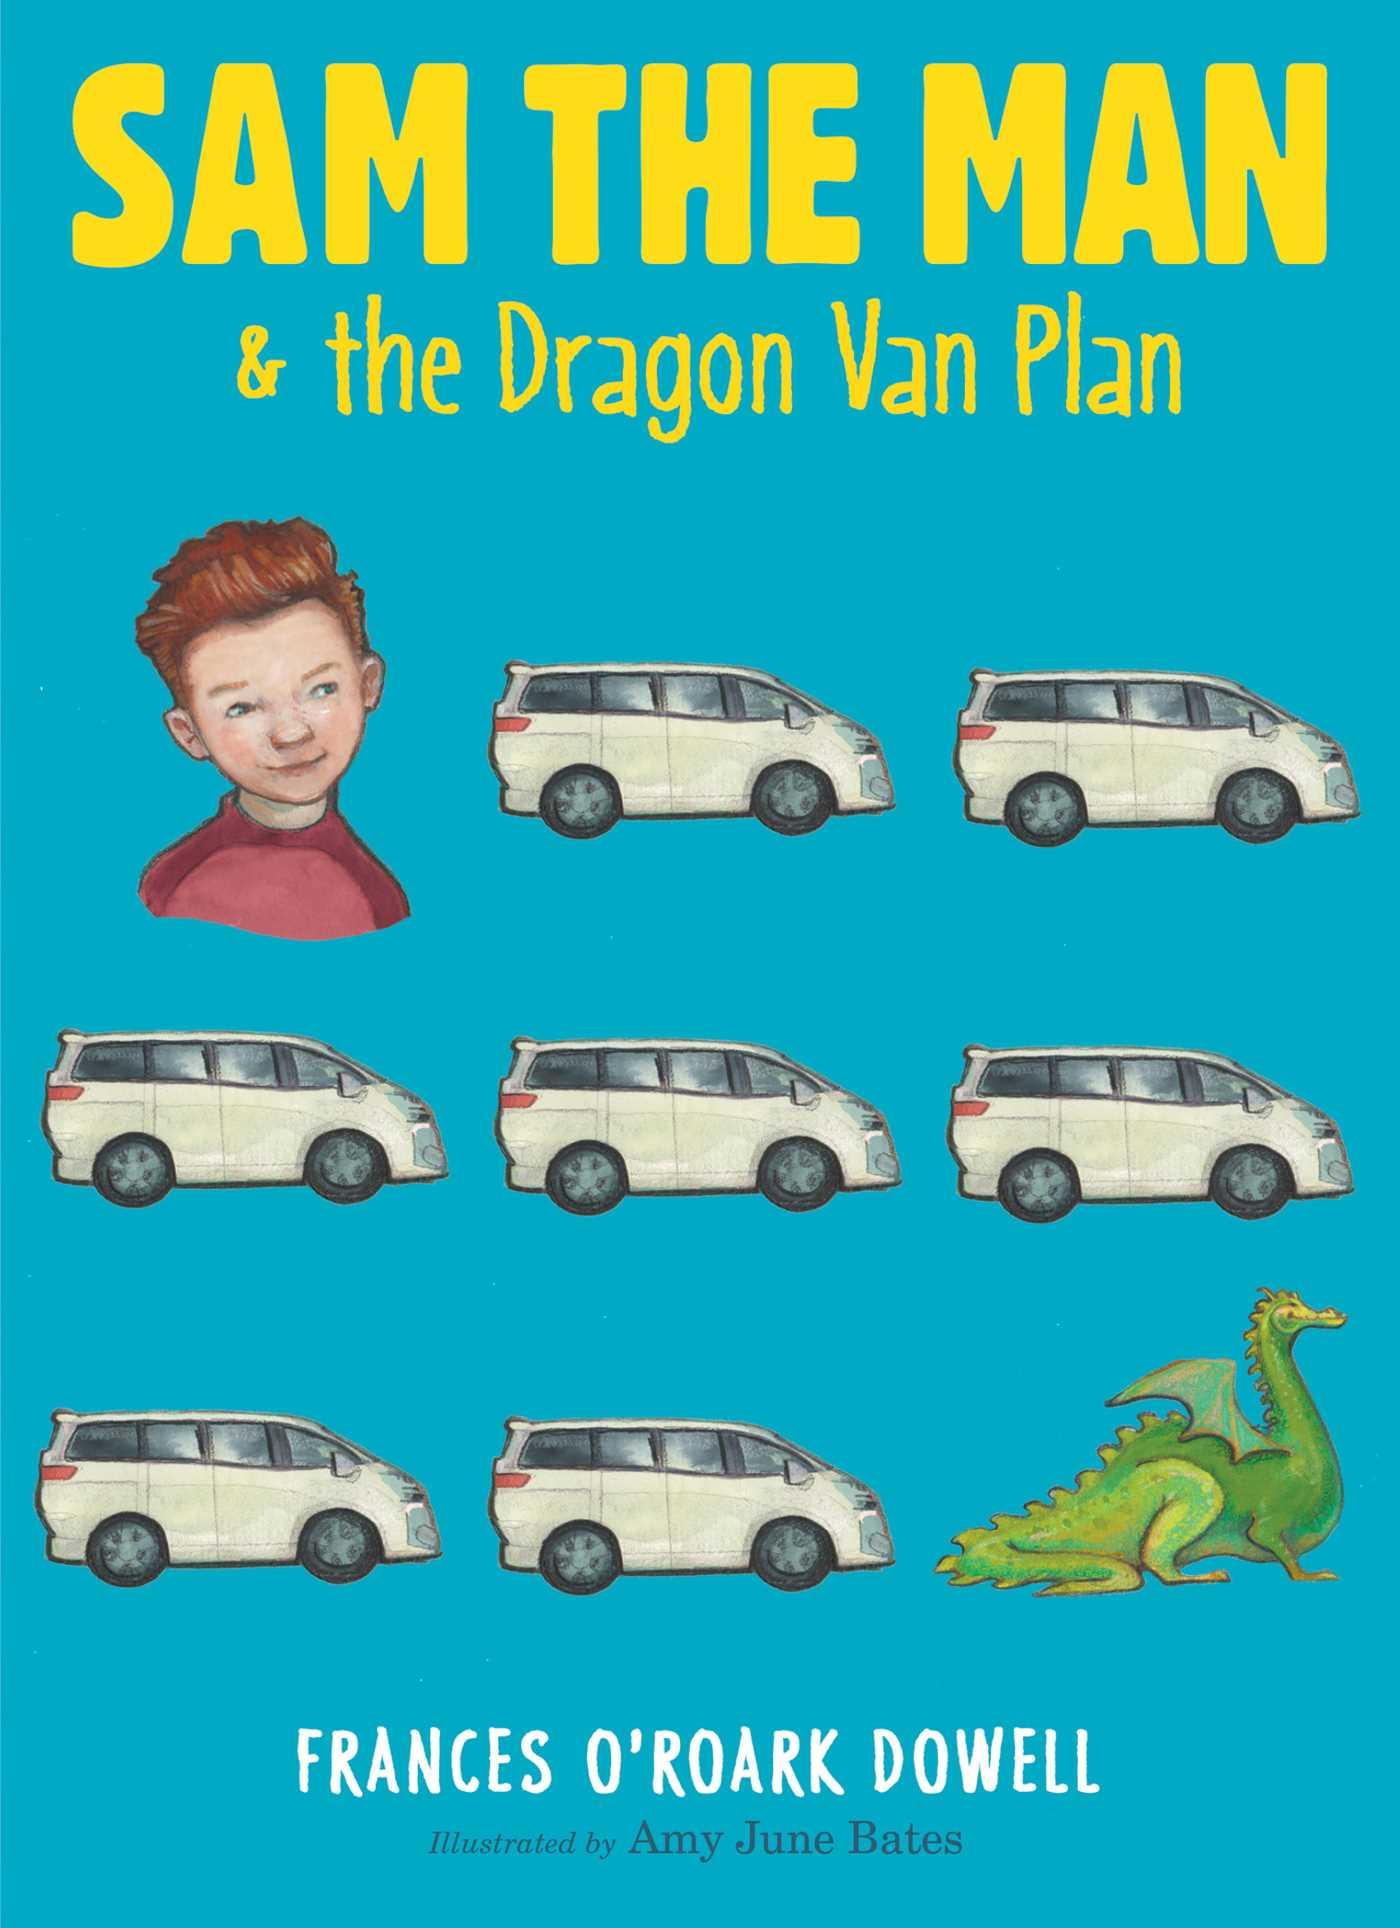 Sam the man the dragon van plan 9781481440721 hr